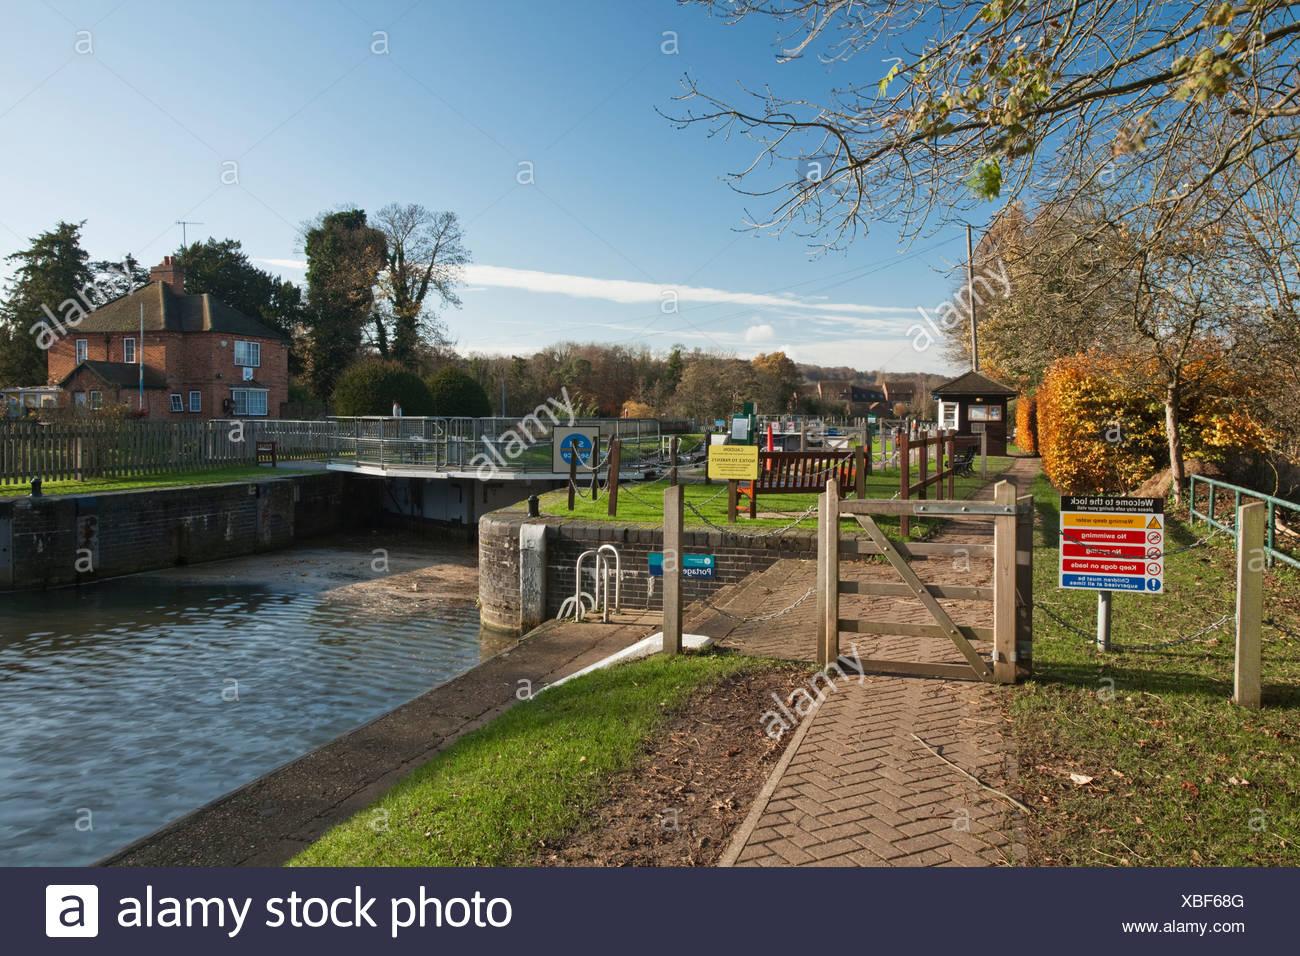 Temple Lock on the River Thames, Berkshire, UK - Stock Image